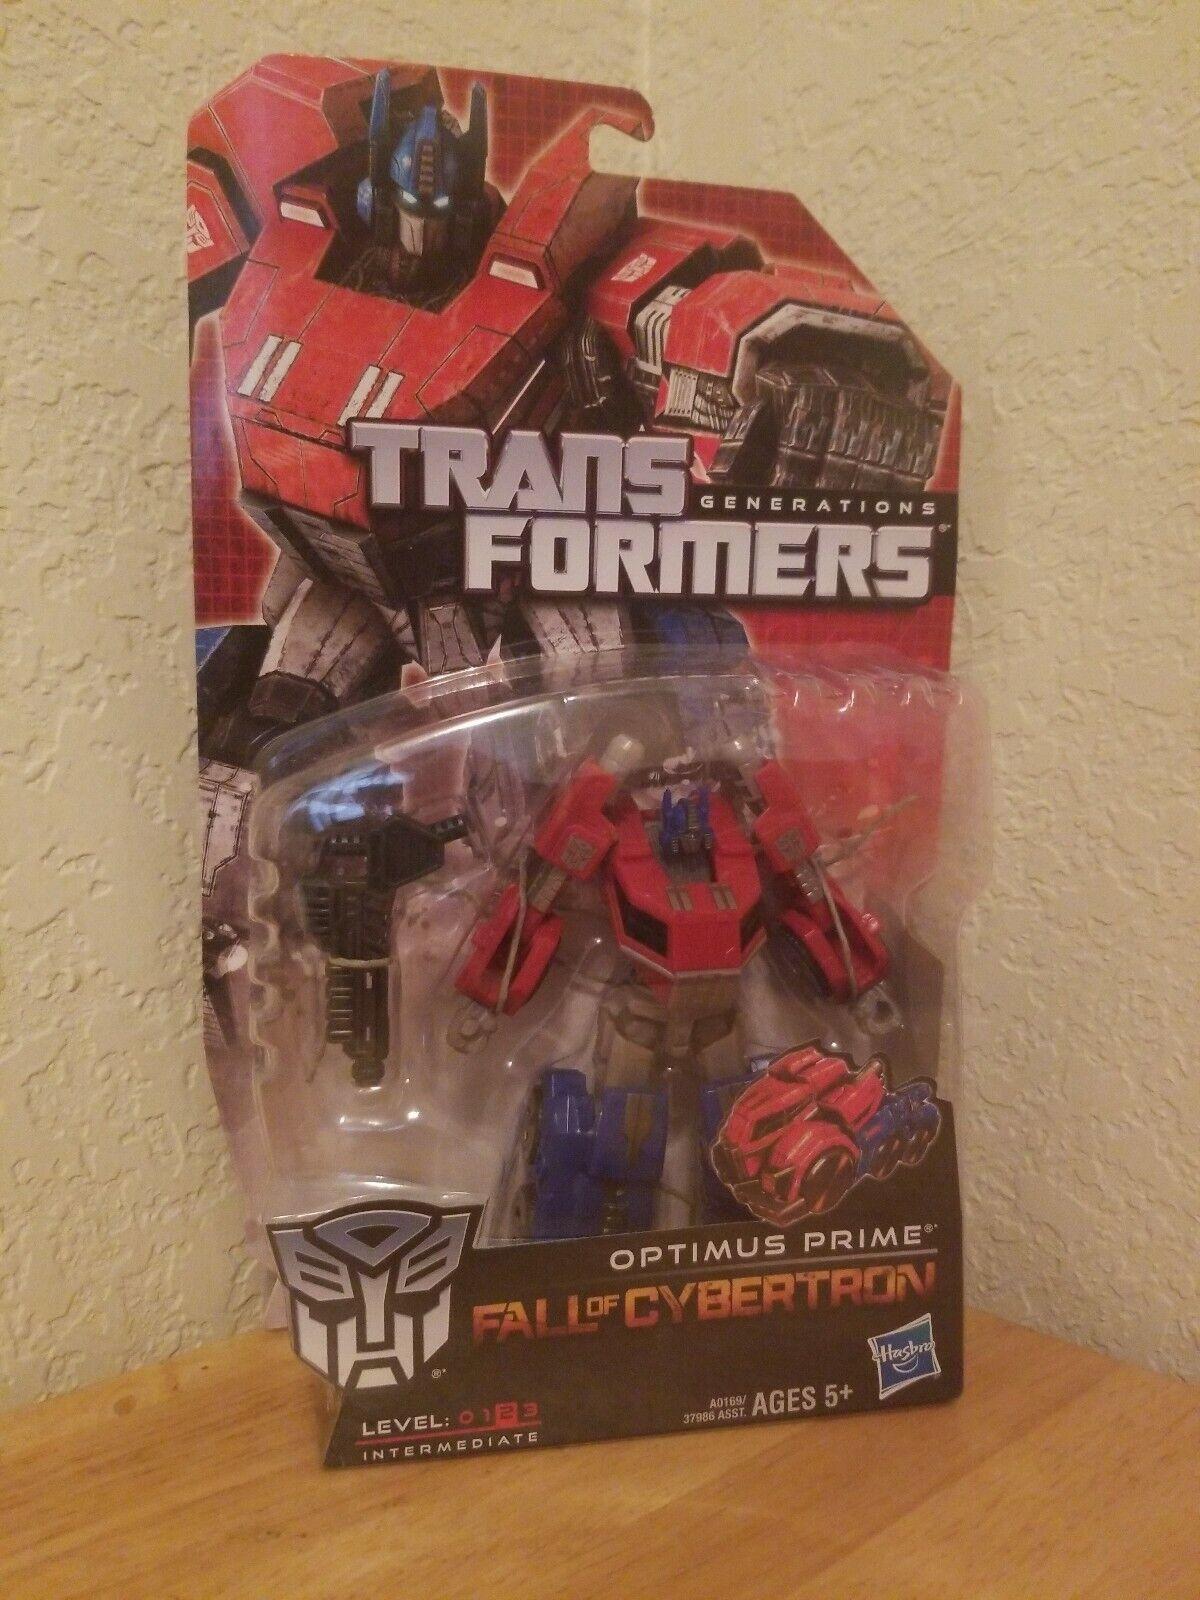 OPTIMUS PRIME Transformers Generations Deluxe Class Autobot figure FOC BENT CARD